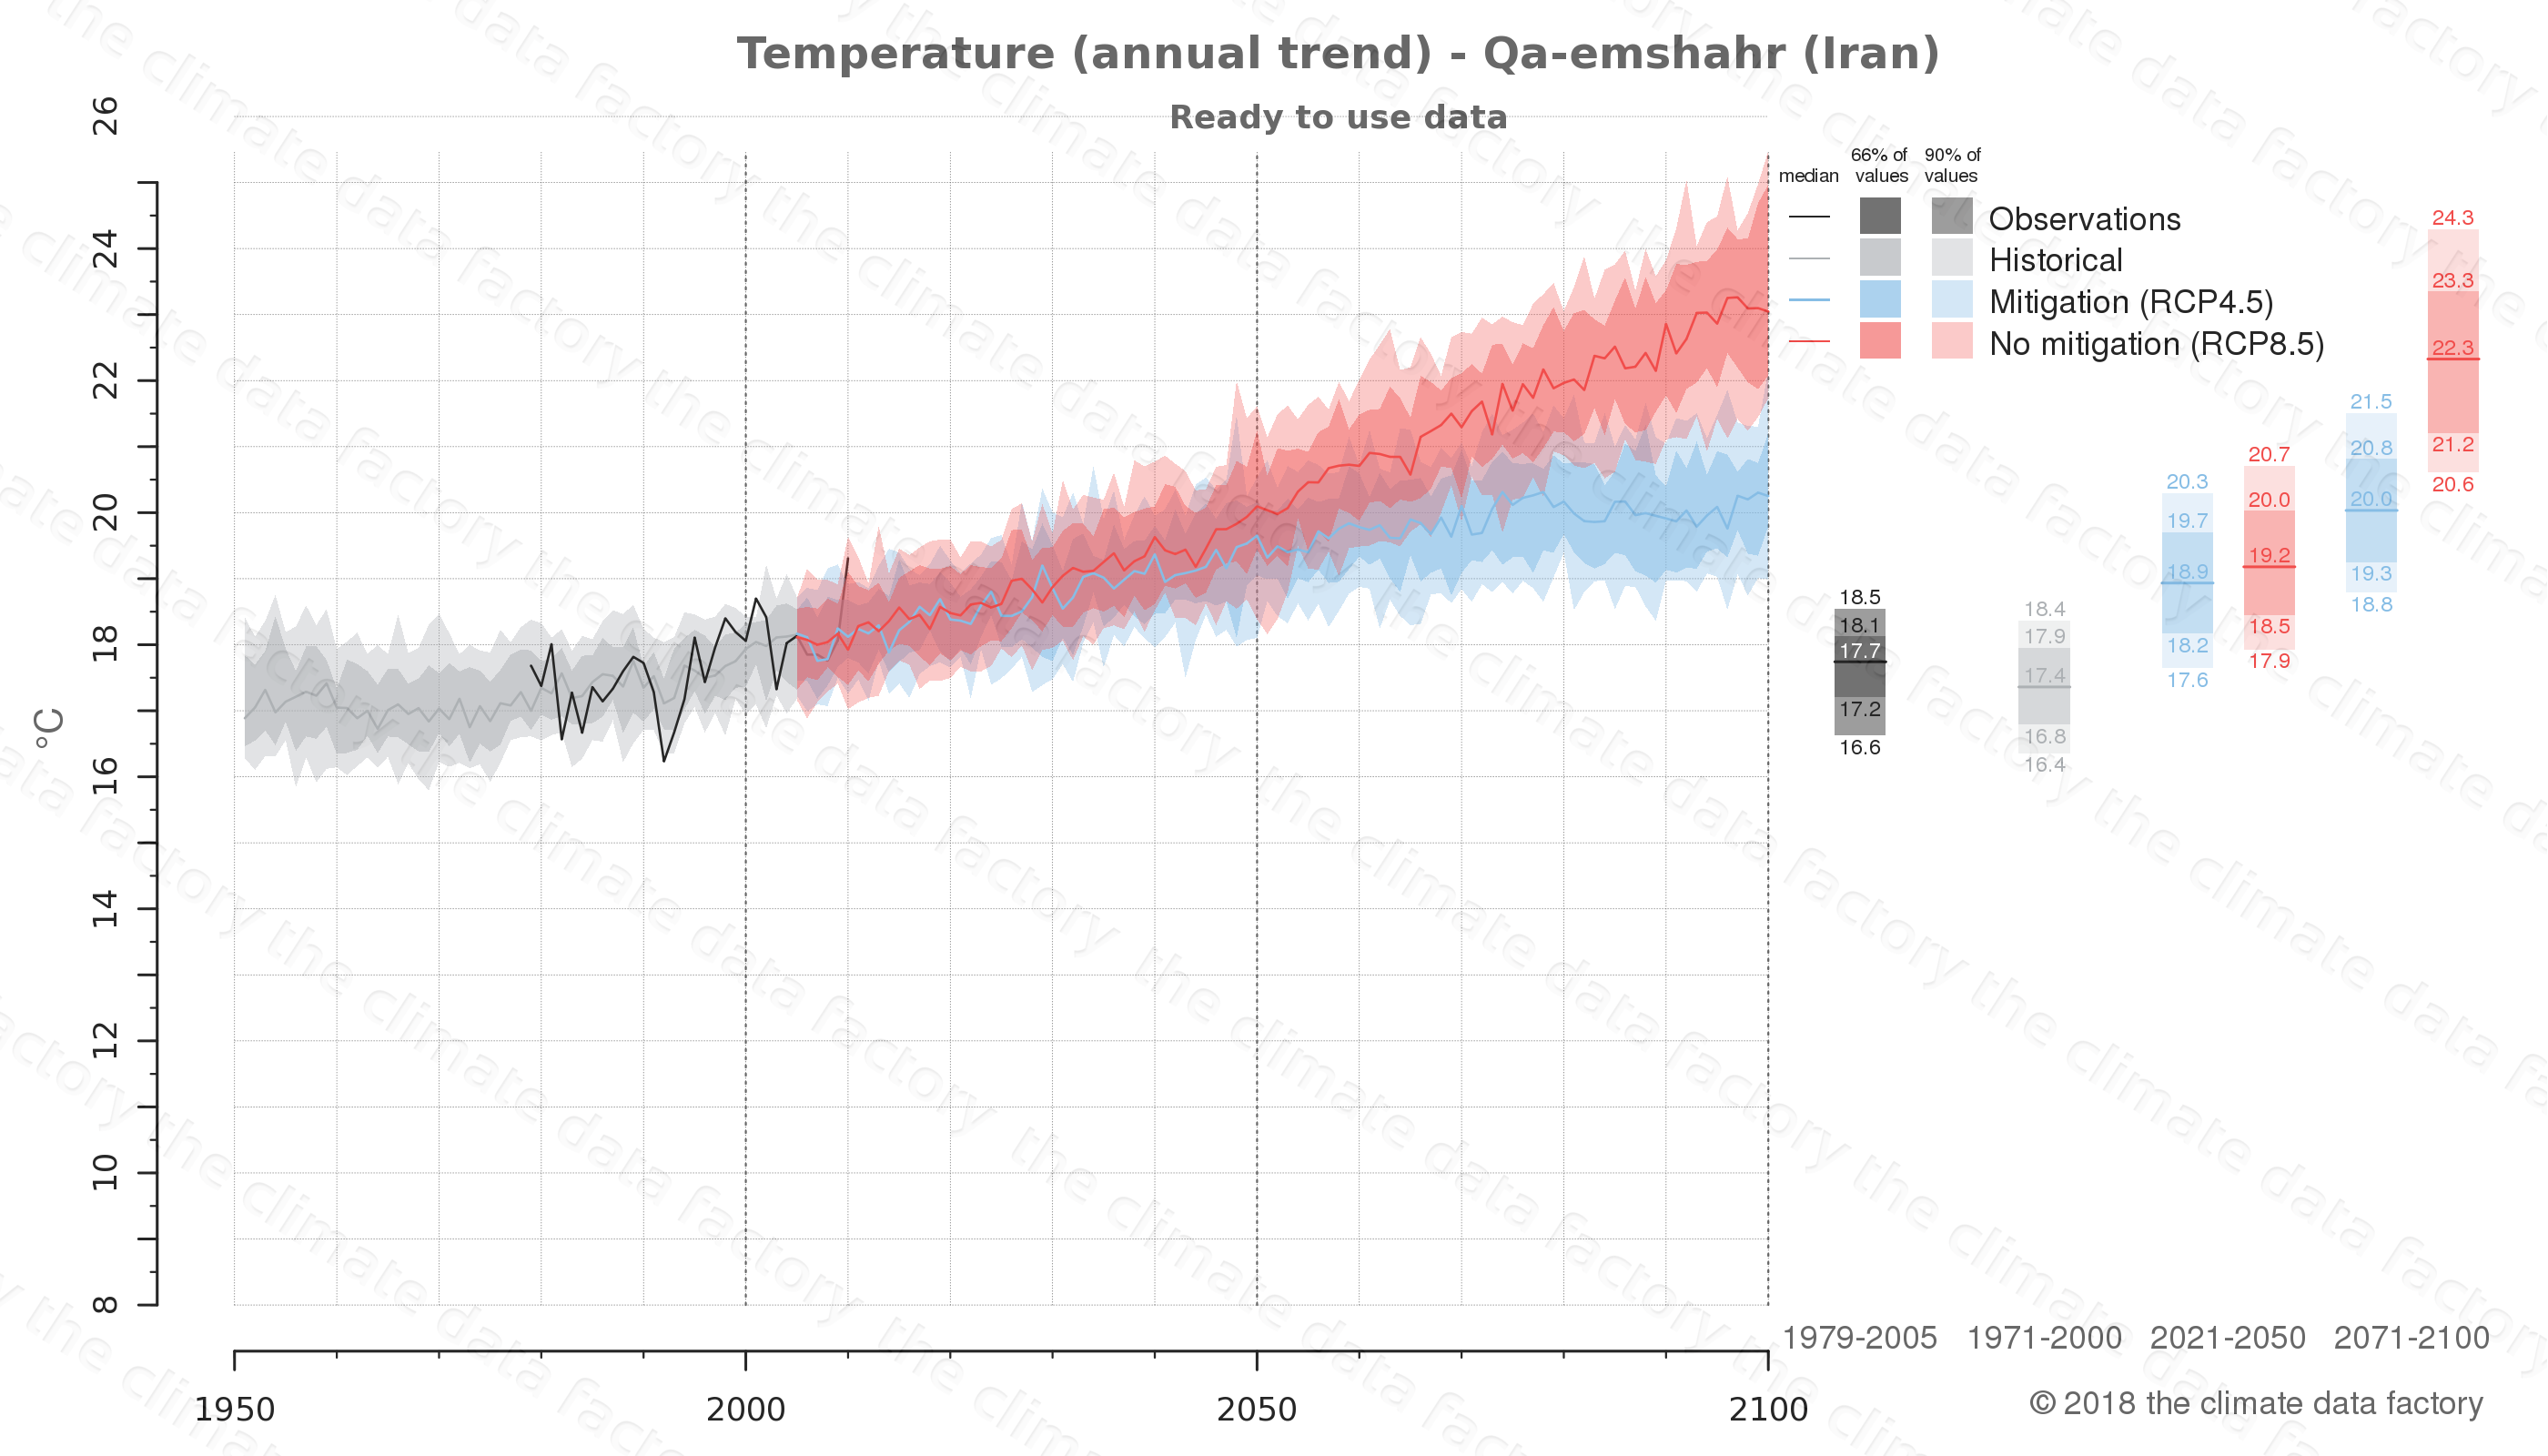 climate change data policy adaptation climate graph city data temperature qa-emshahr iran